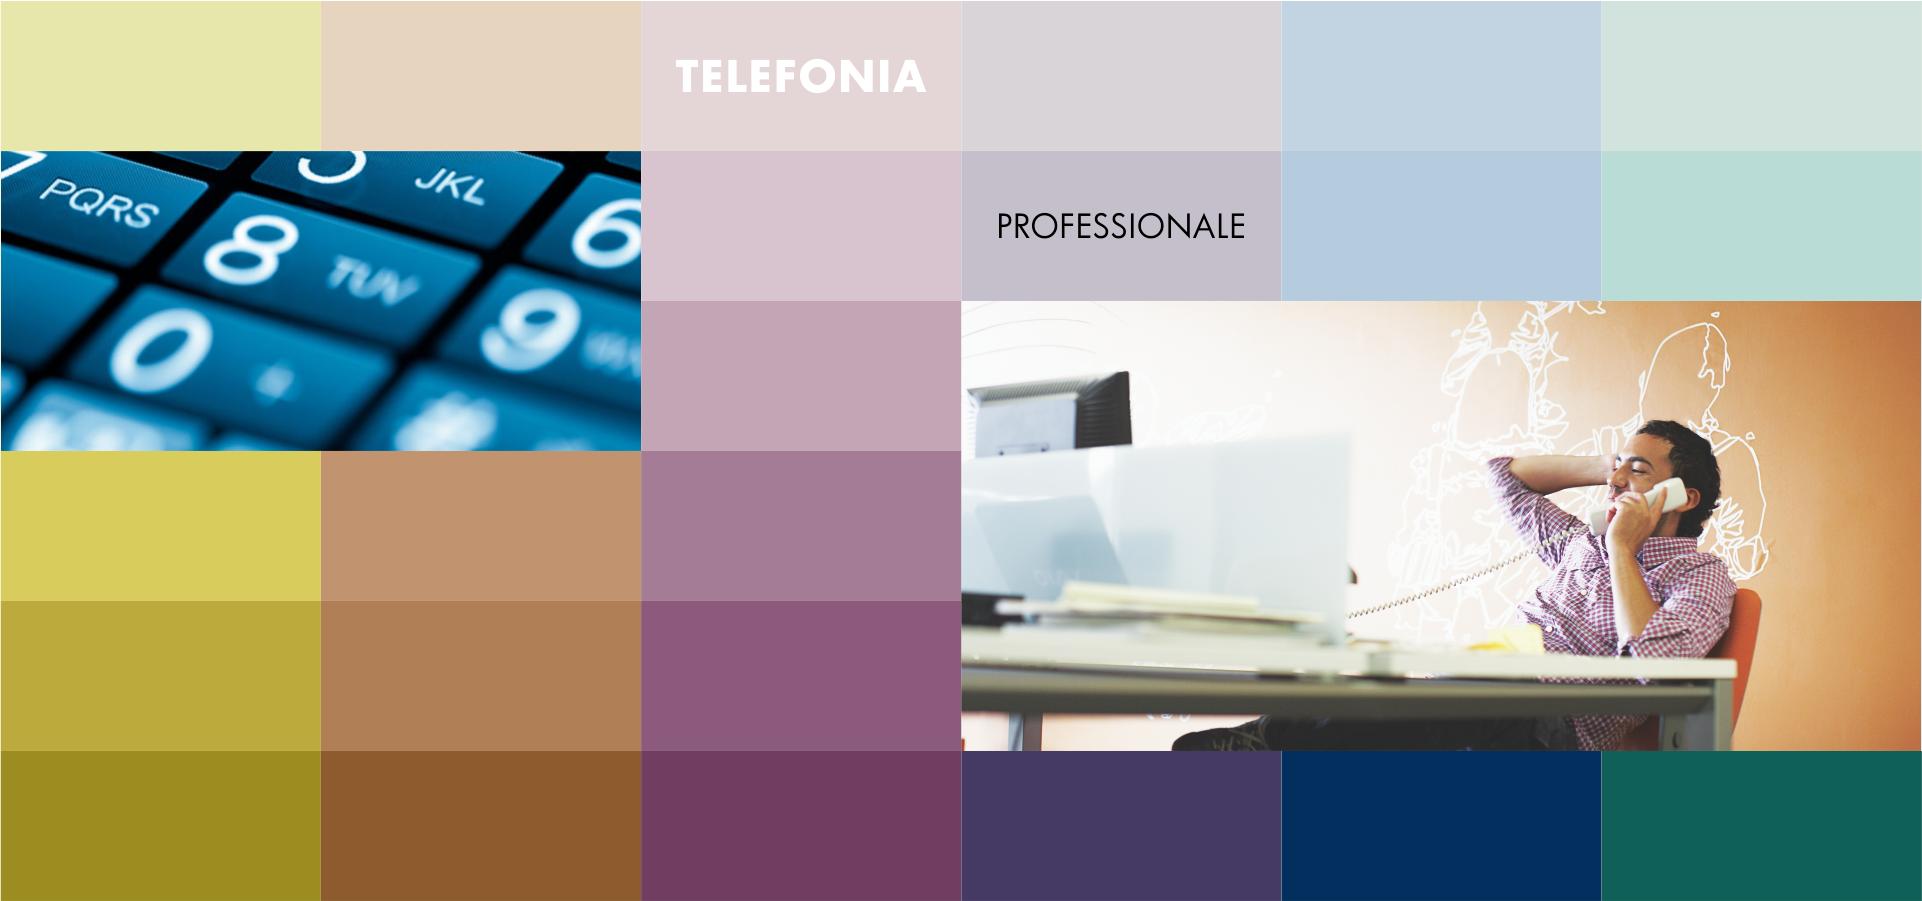 promelit - telefonia professionale.png